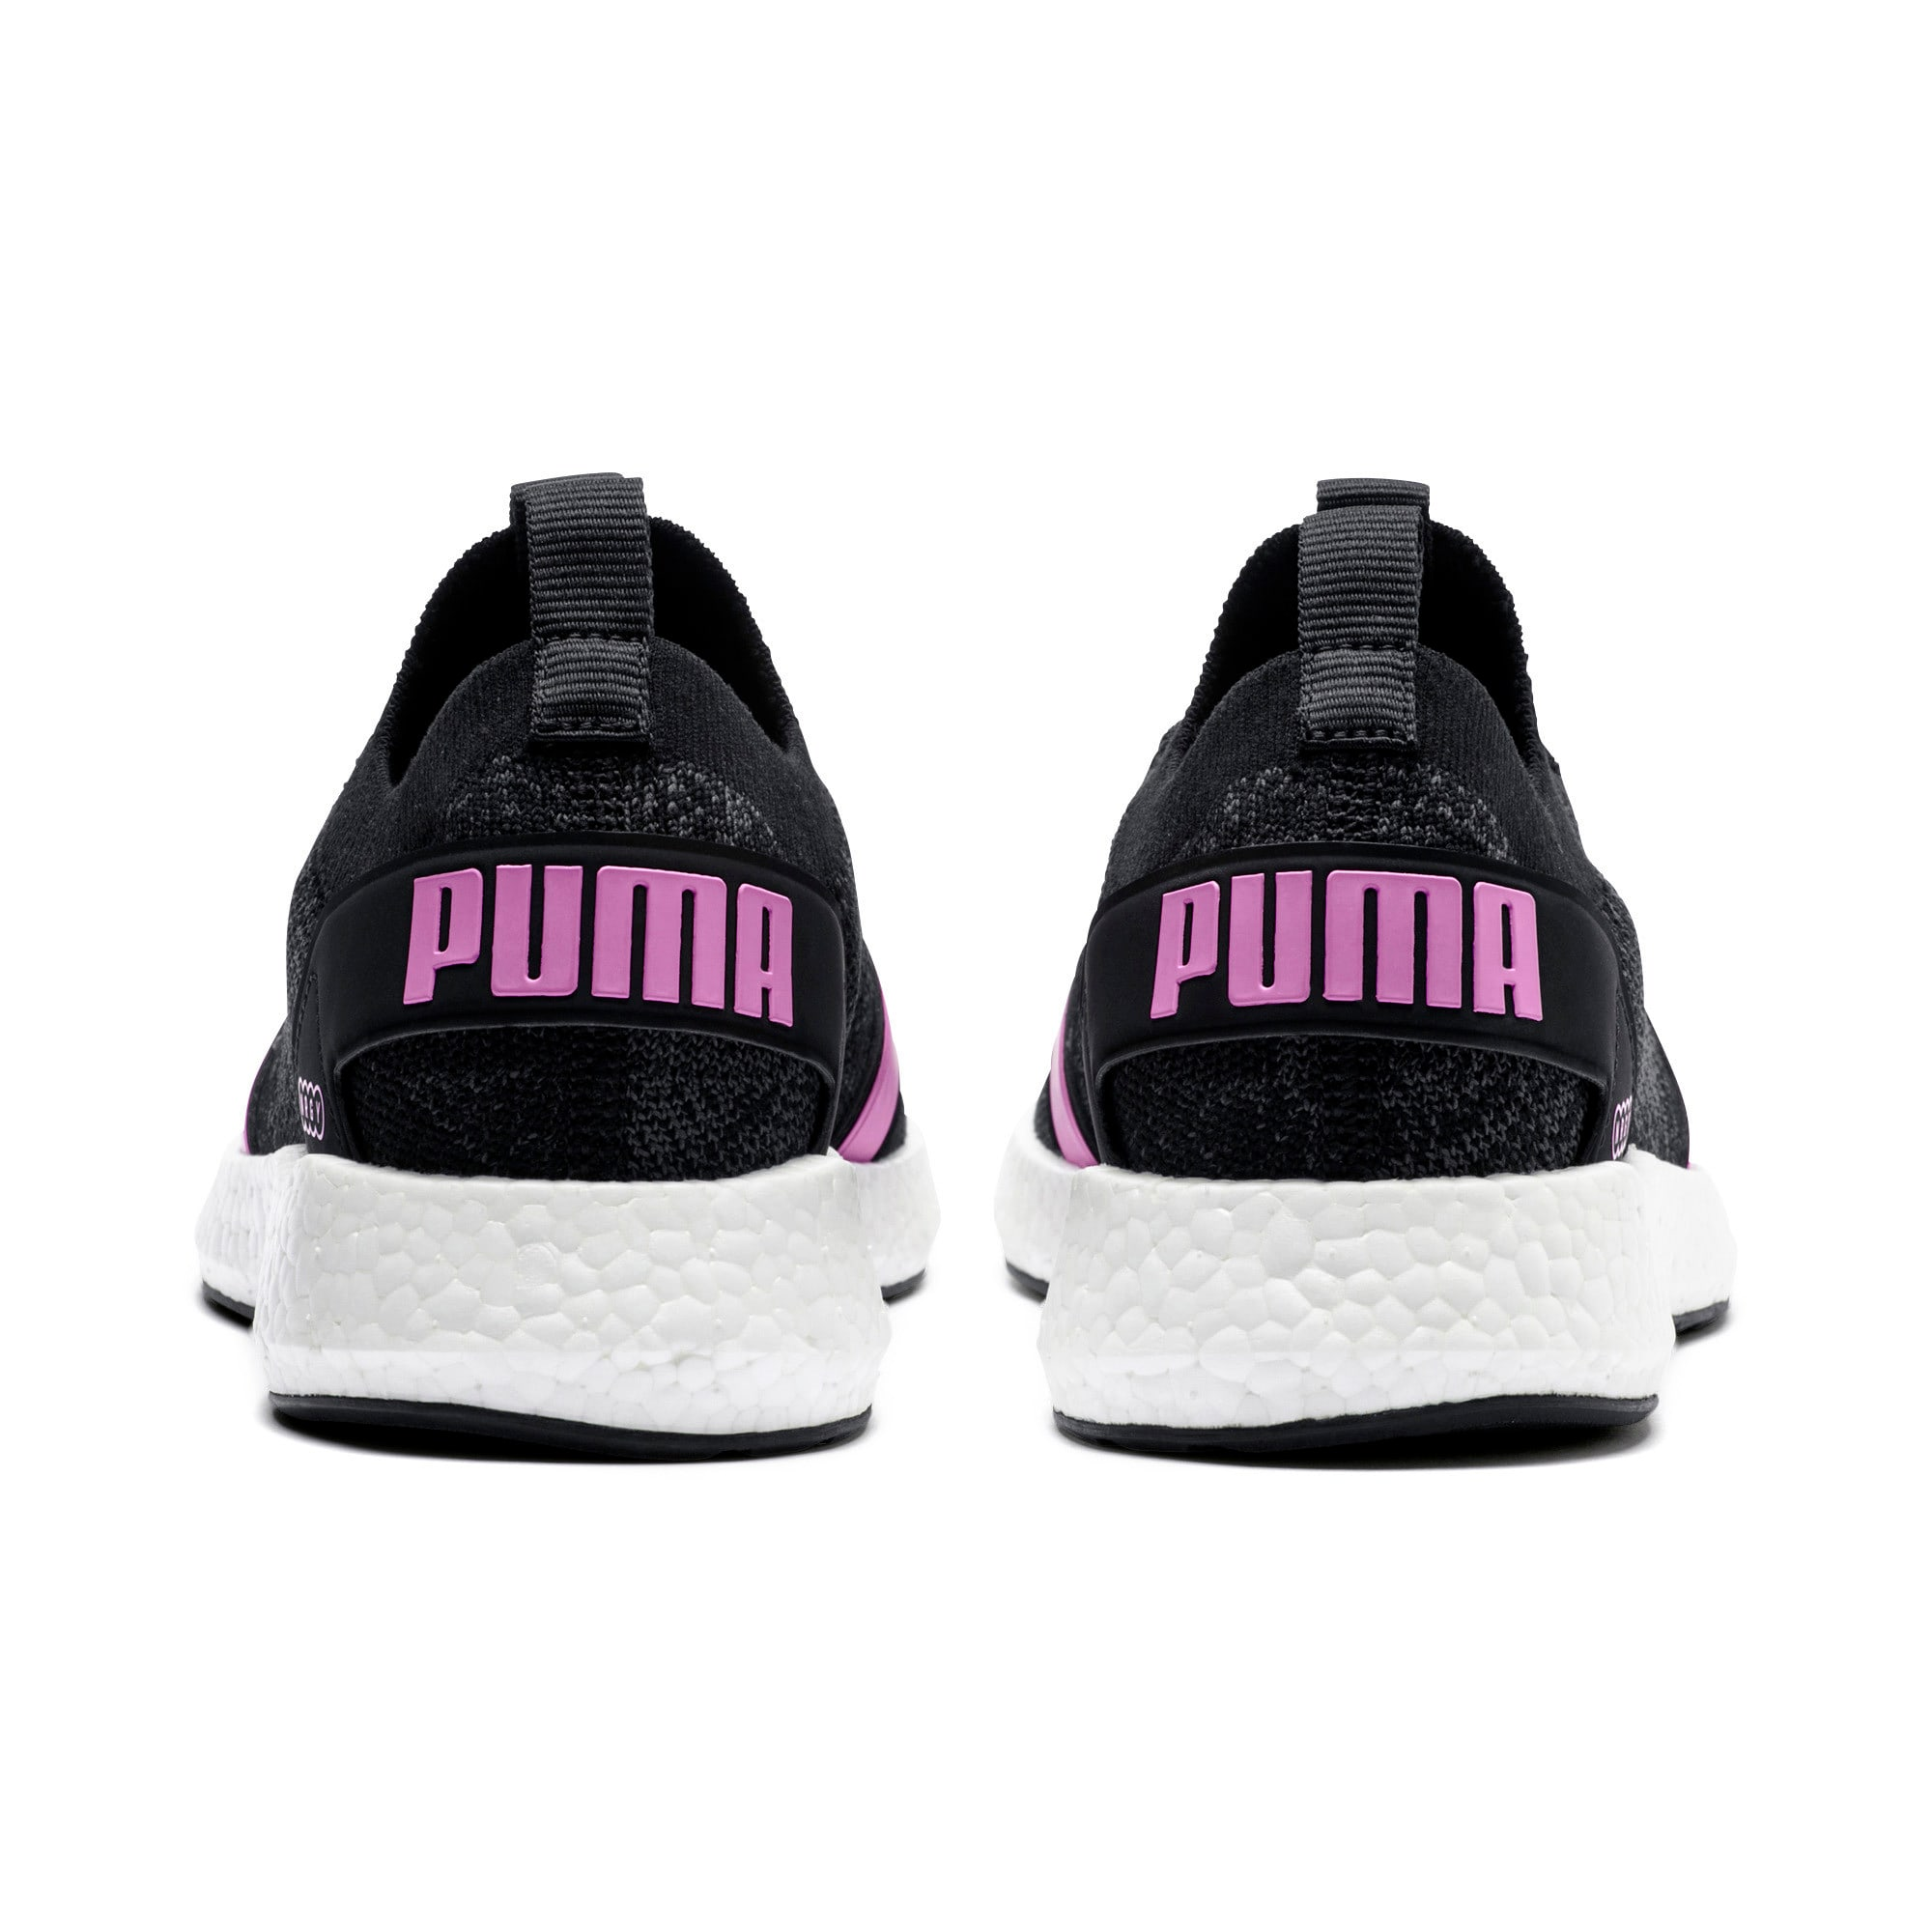 Thumbnail 4 of NRGY Neko Engineer Knit Women's Running Shoes, Puma Black-Iron Gate-Orchid, medium